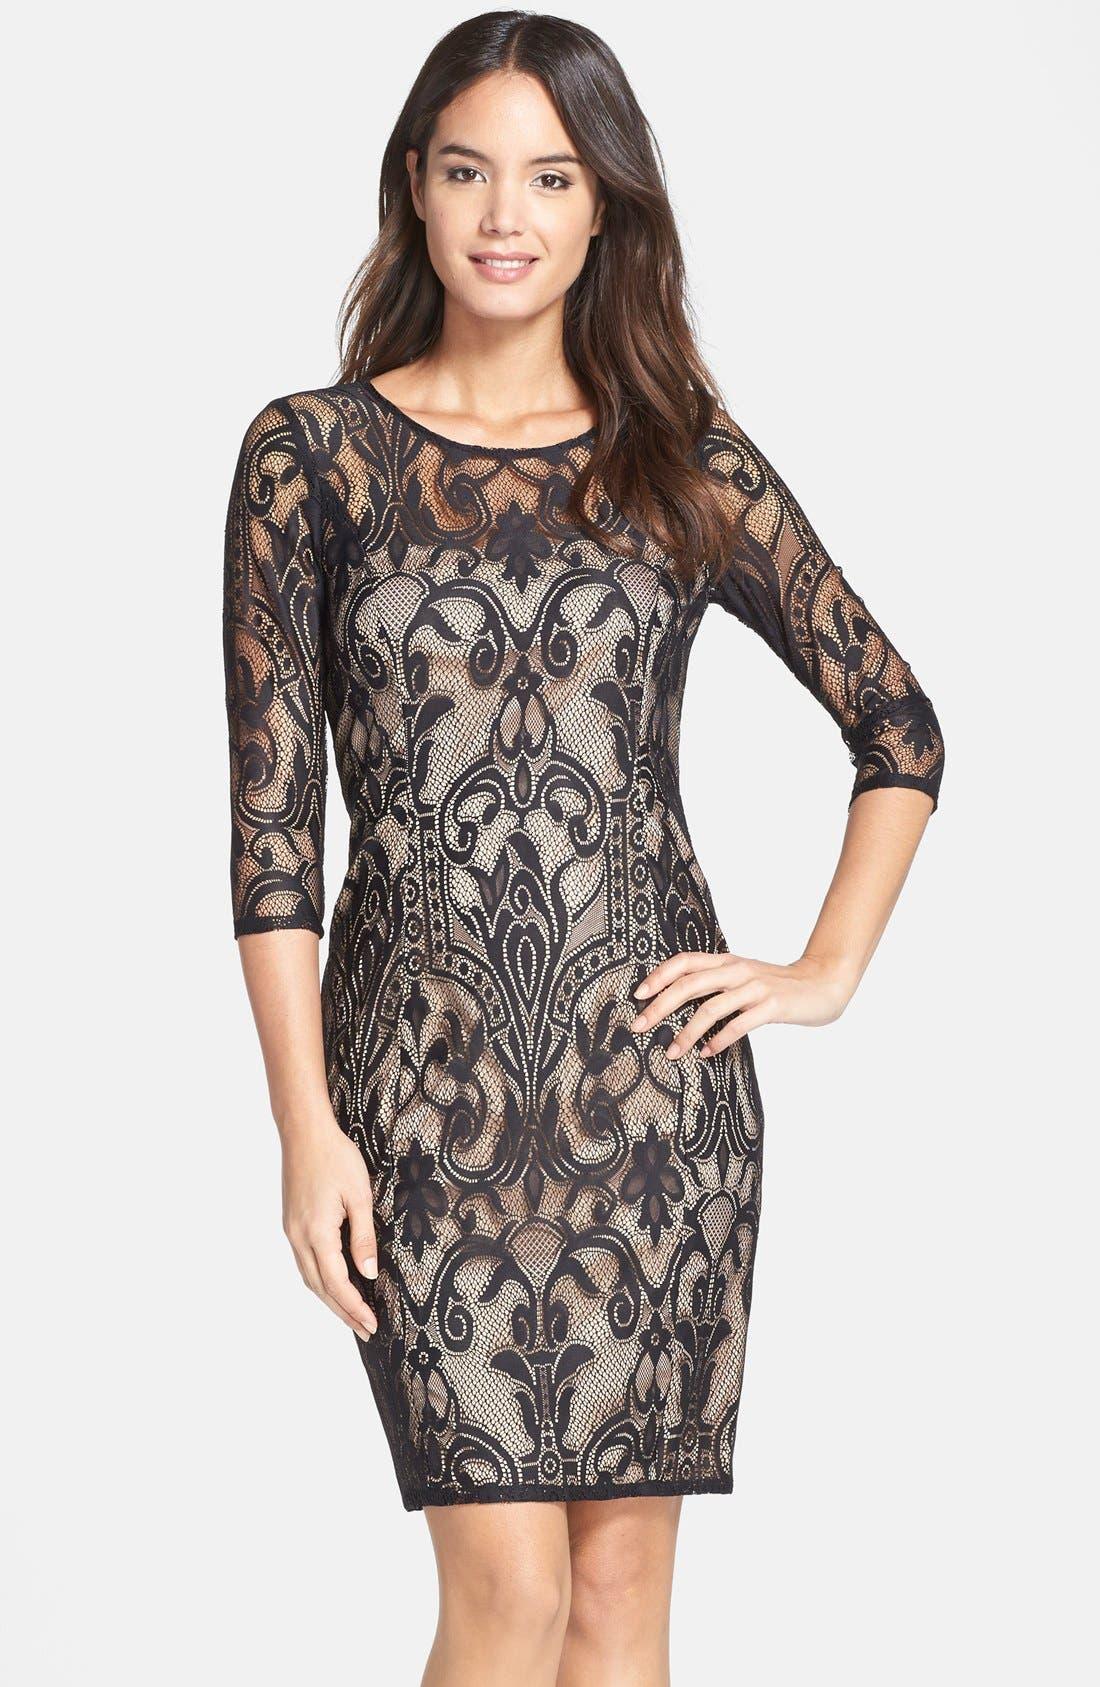 Alternate Image 1 Selected - Adrianna Papell Lace Sheath Dress (Regular & Petite)